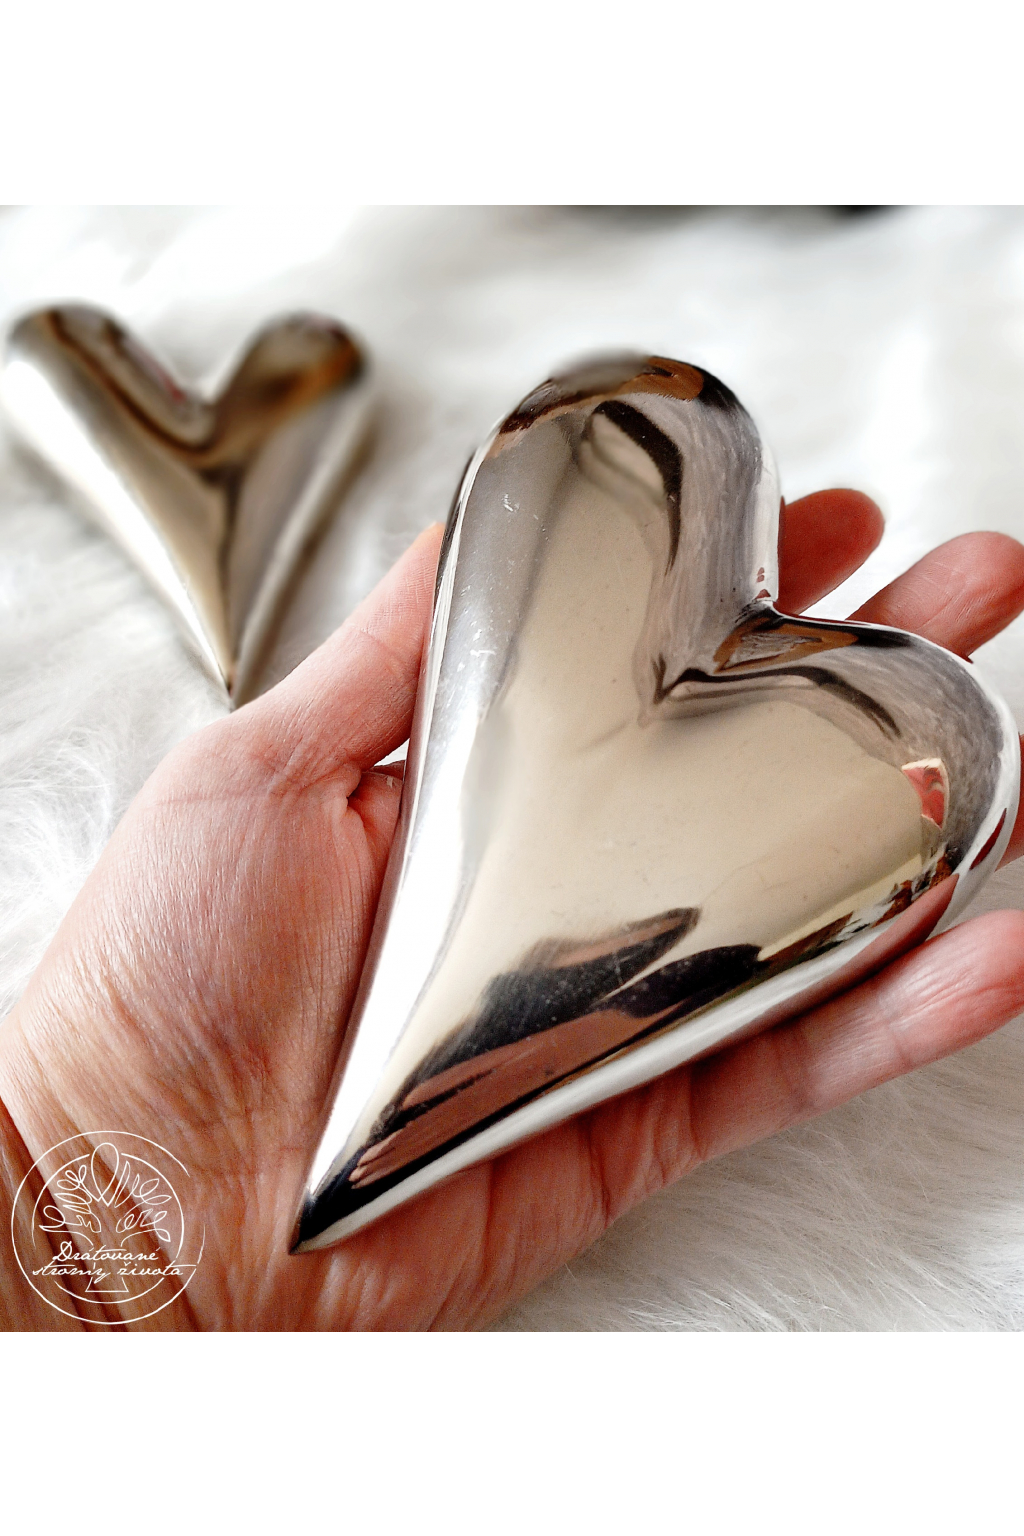 Srdce - Láska na dlani  15cm